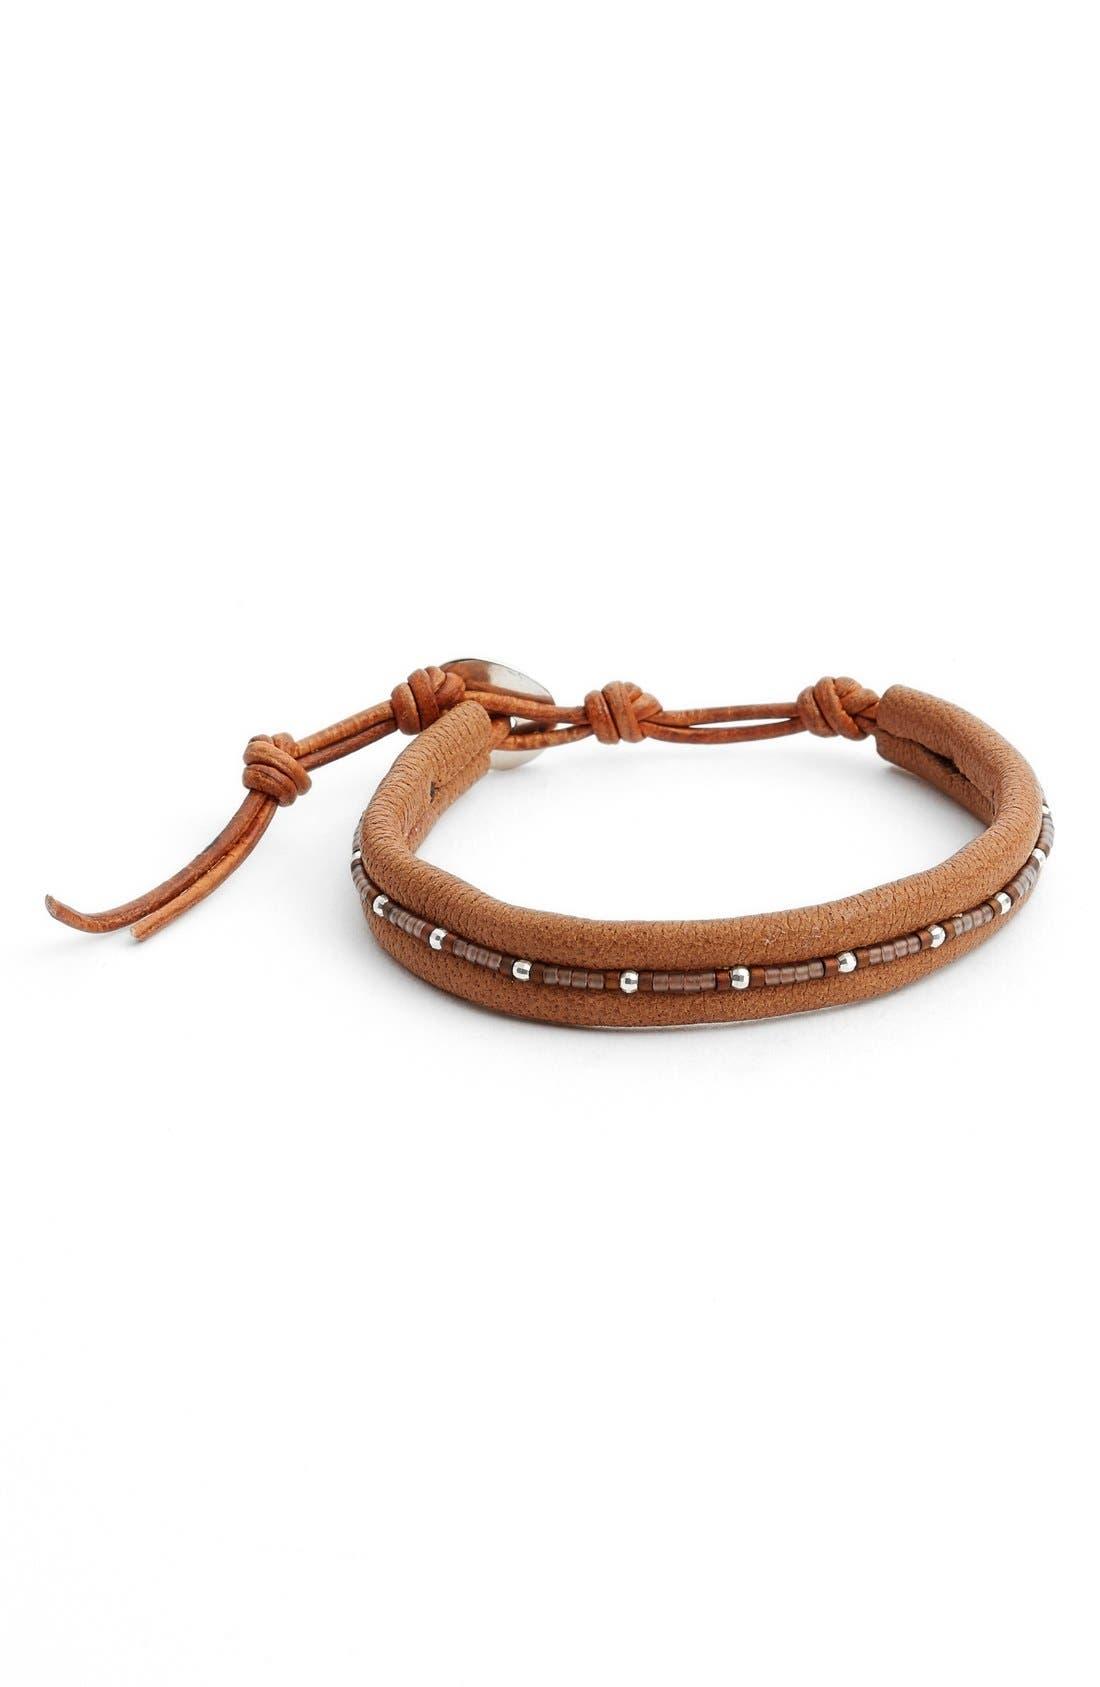 Alternate Image 1 Selected - Chan Luu Seed Beed Leather Bracelet